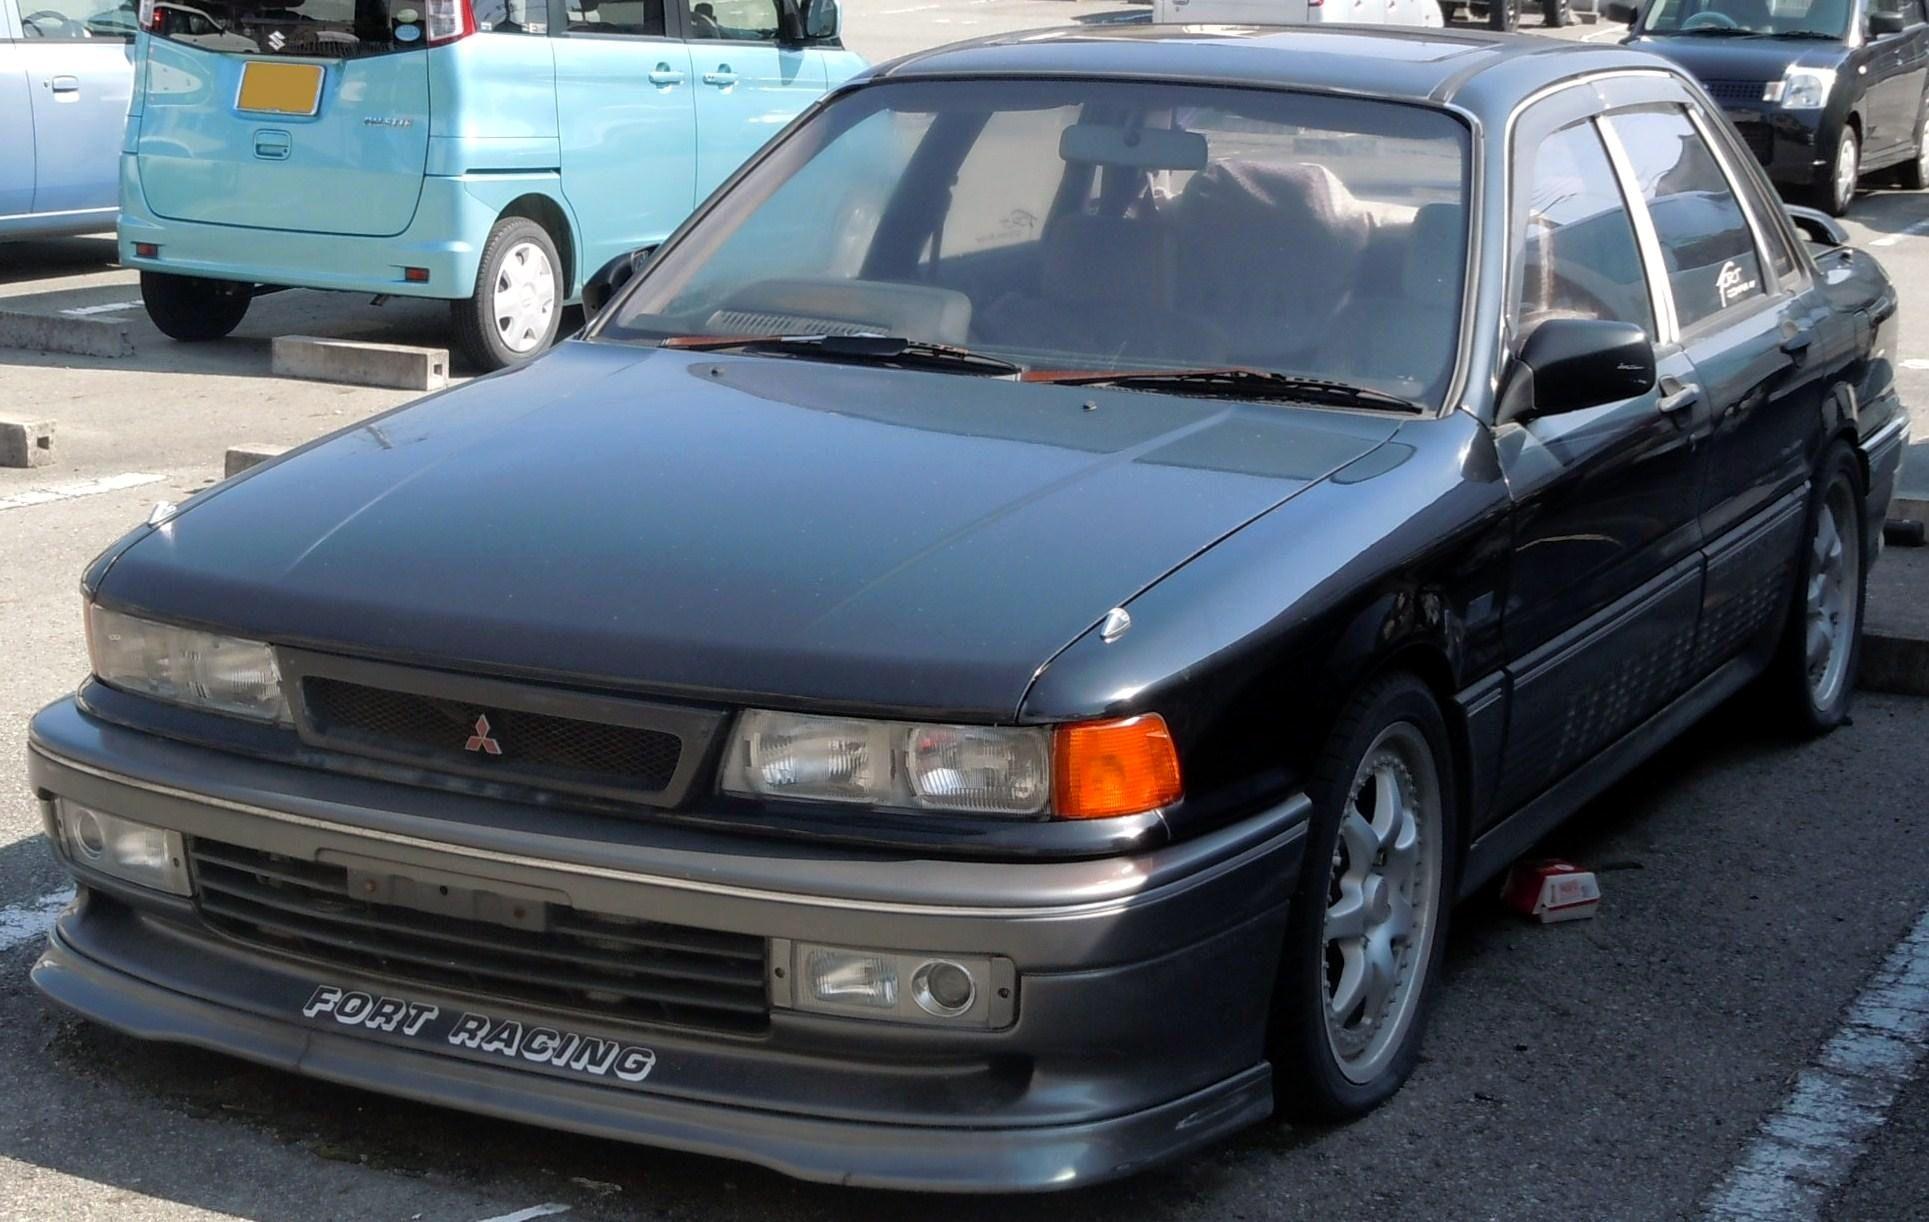 Mitsubishi Galant Vr 4 E39 旧車 三菱自動車 三菱ギャラン